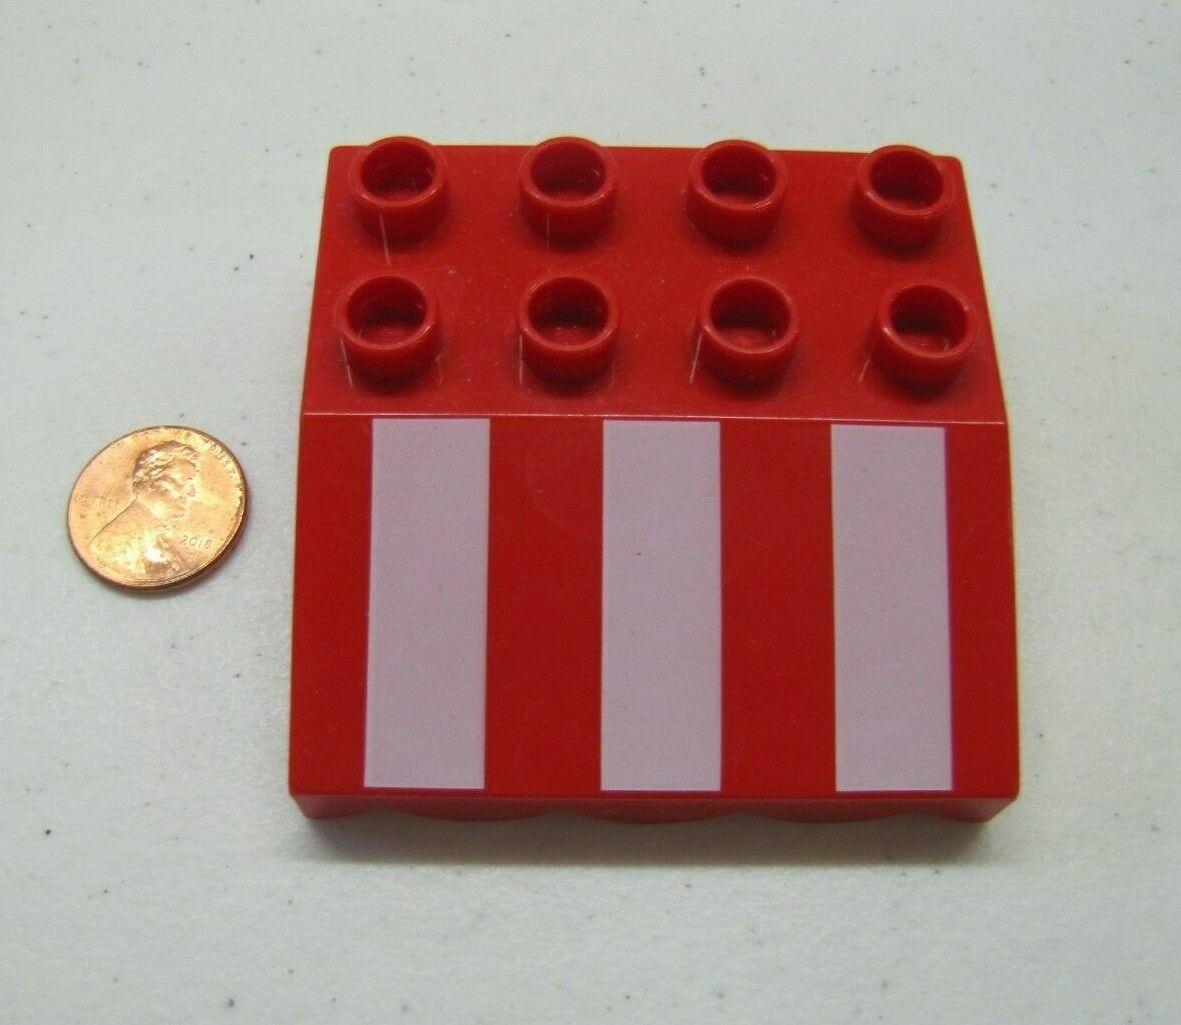 Lego Duplo PURPLE YELLOW SHINGLE ROOF AWNING Overhang House Block Brick Piece